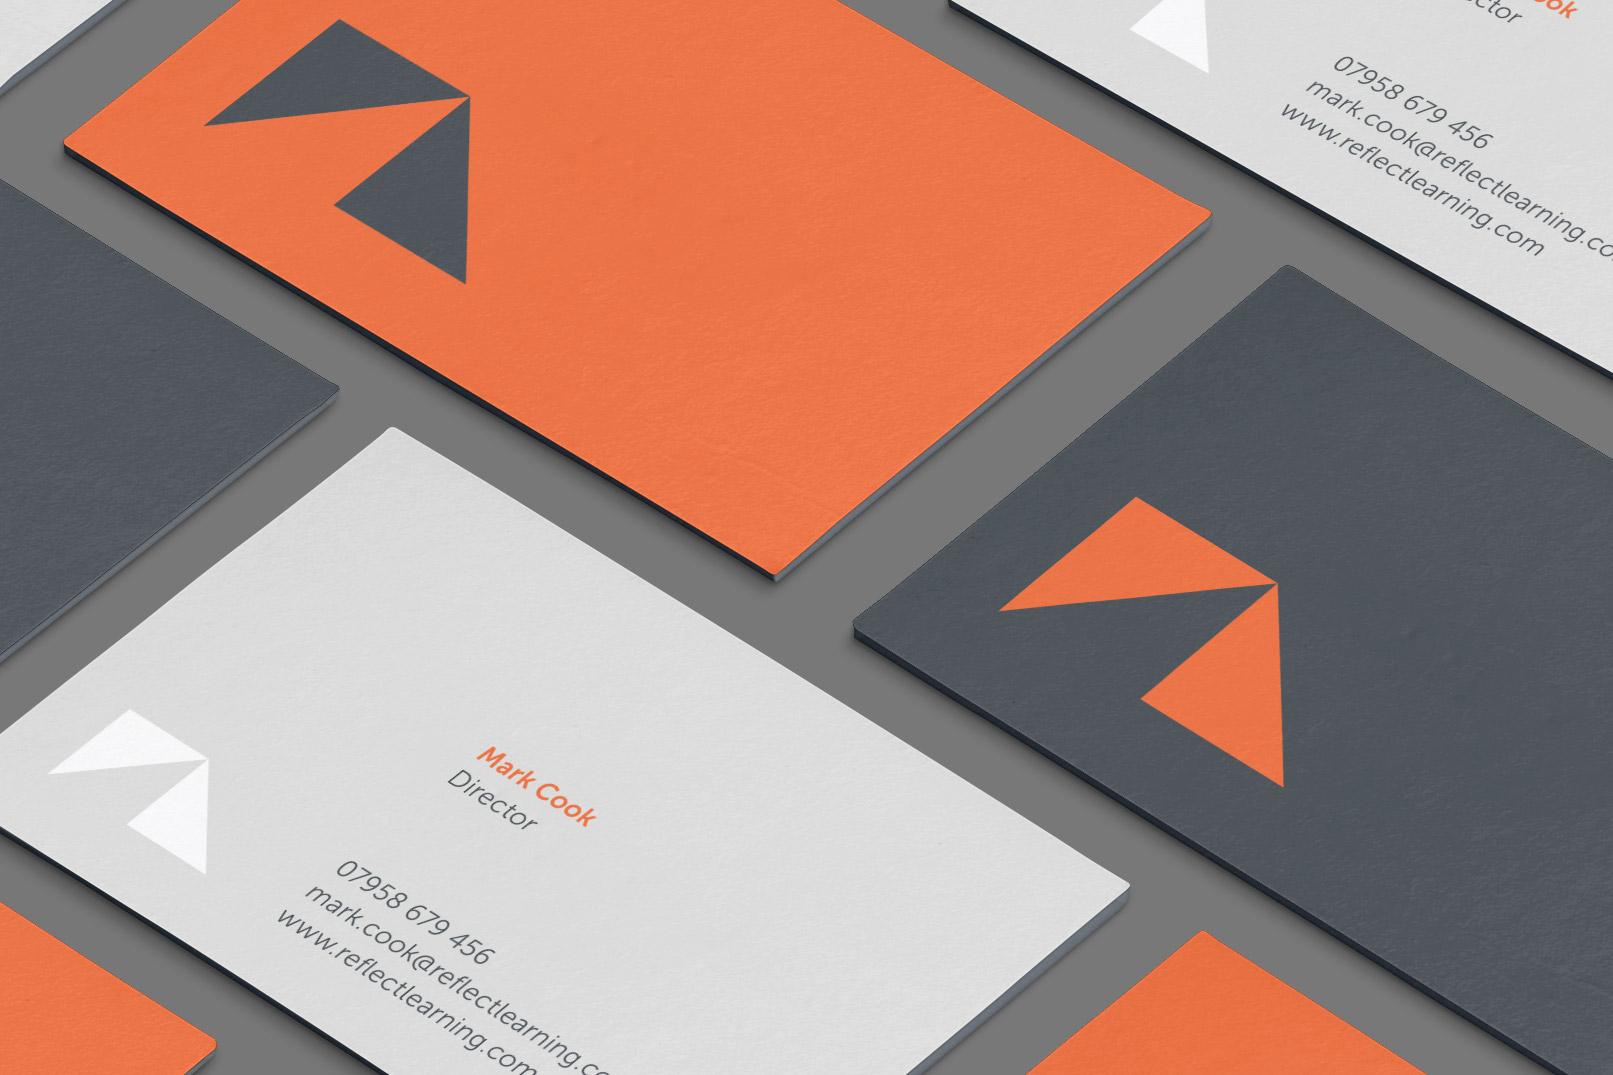 Reflect-Cards-crop.jpg